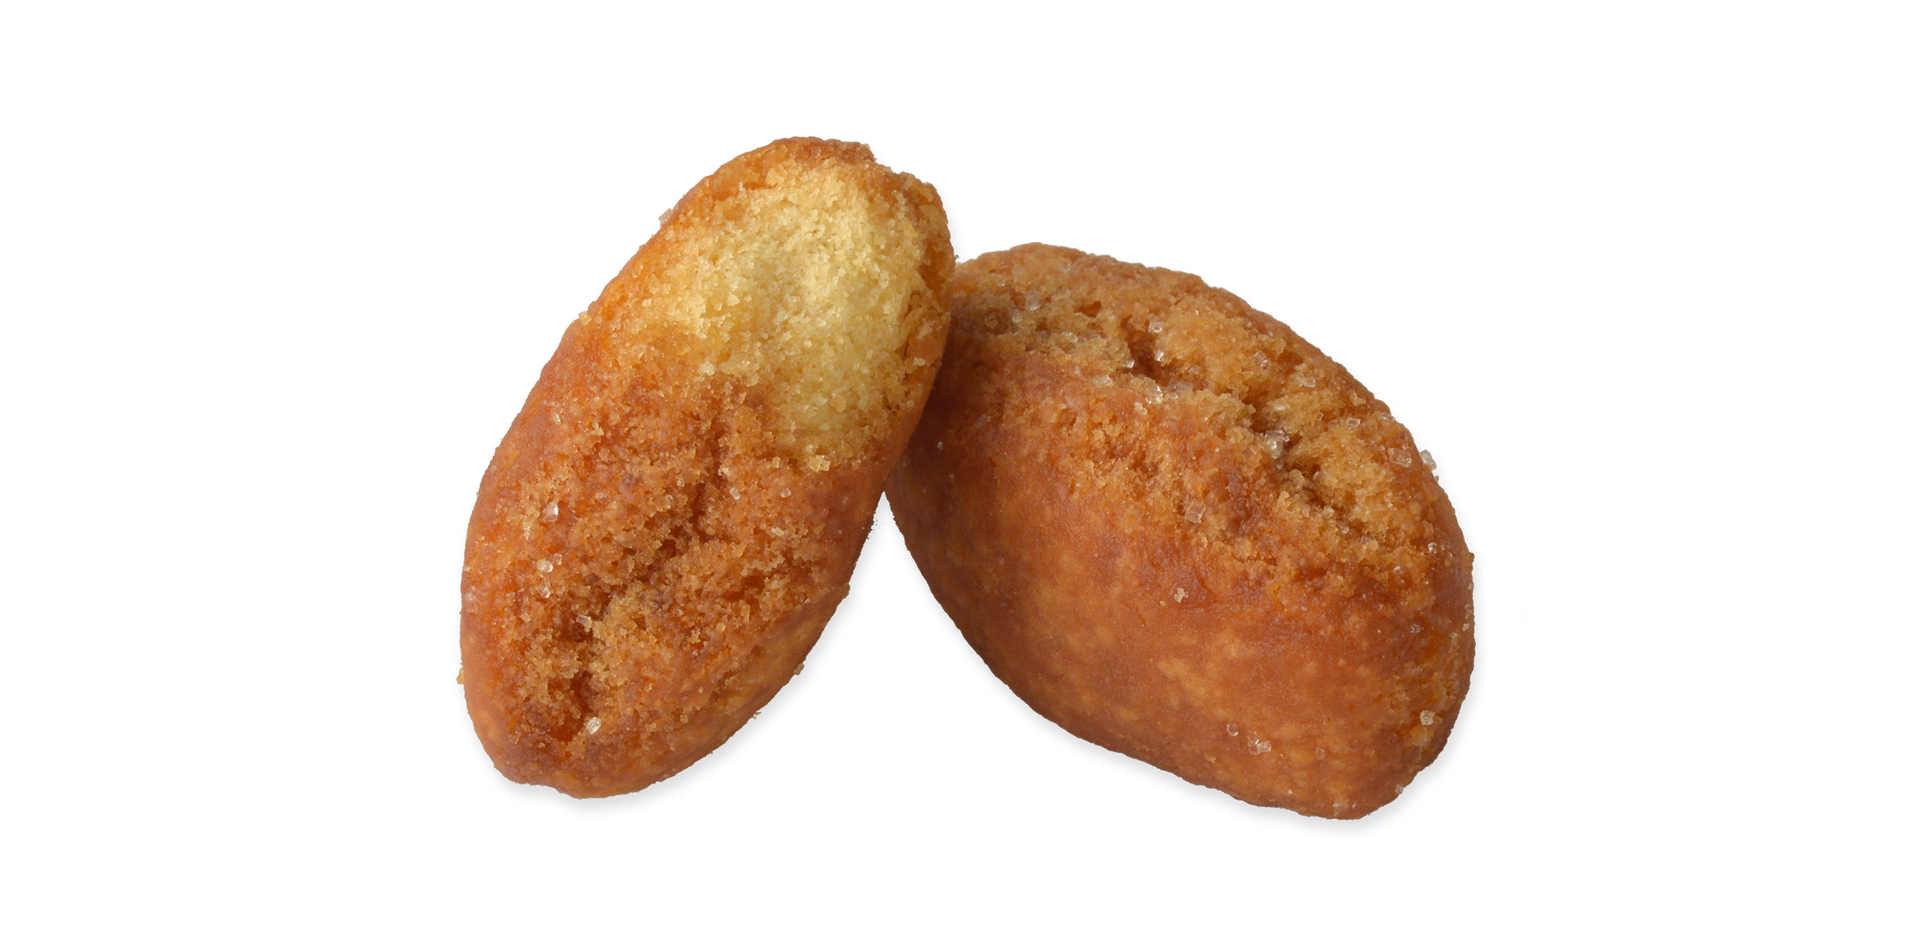 LS_donuts_02.png